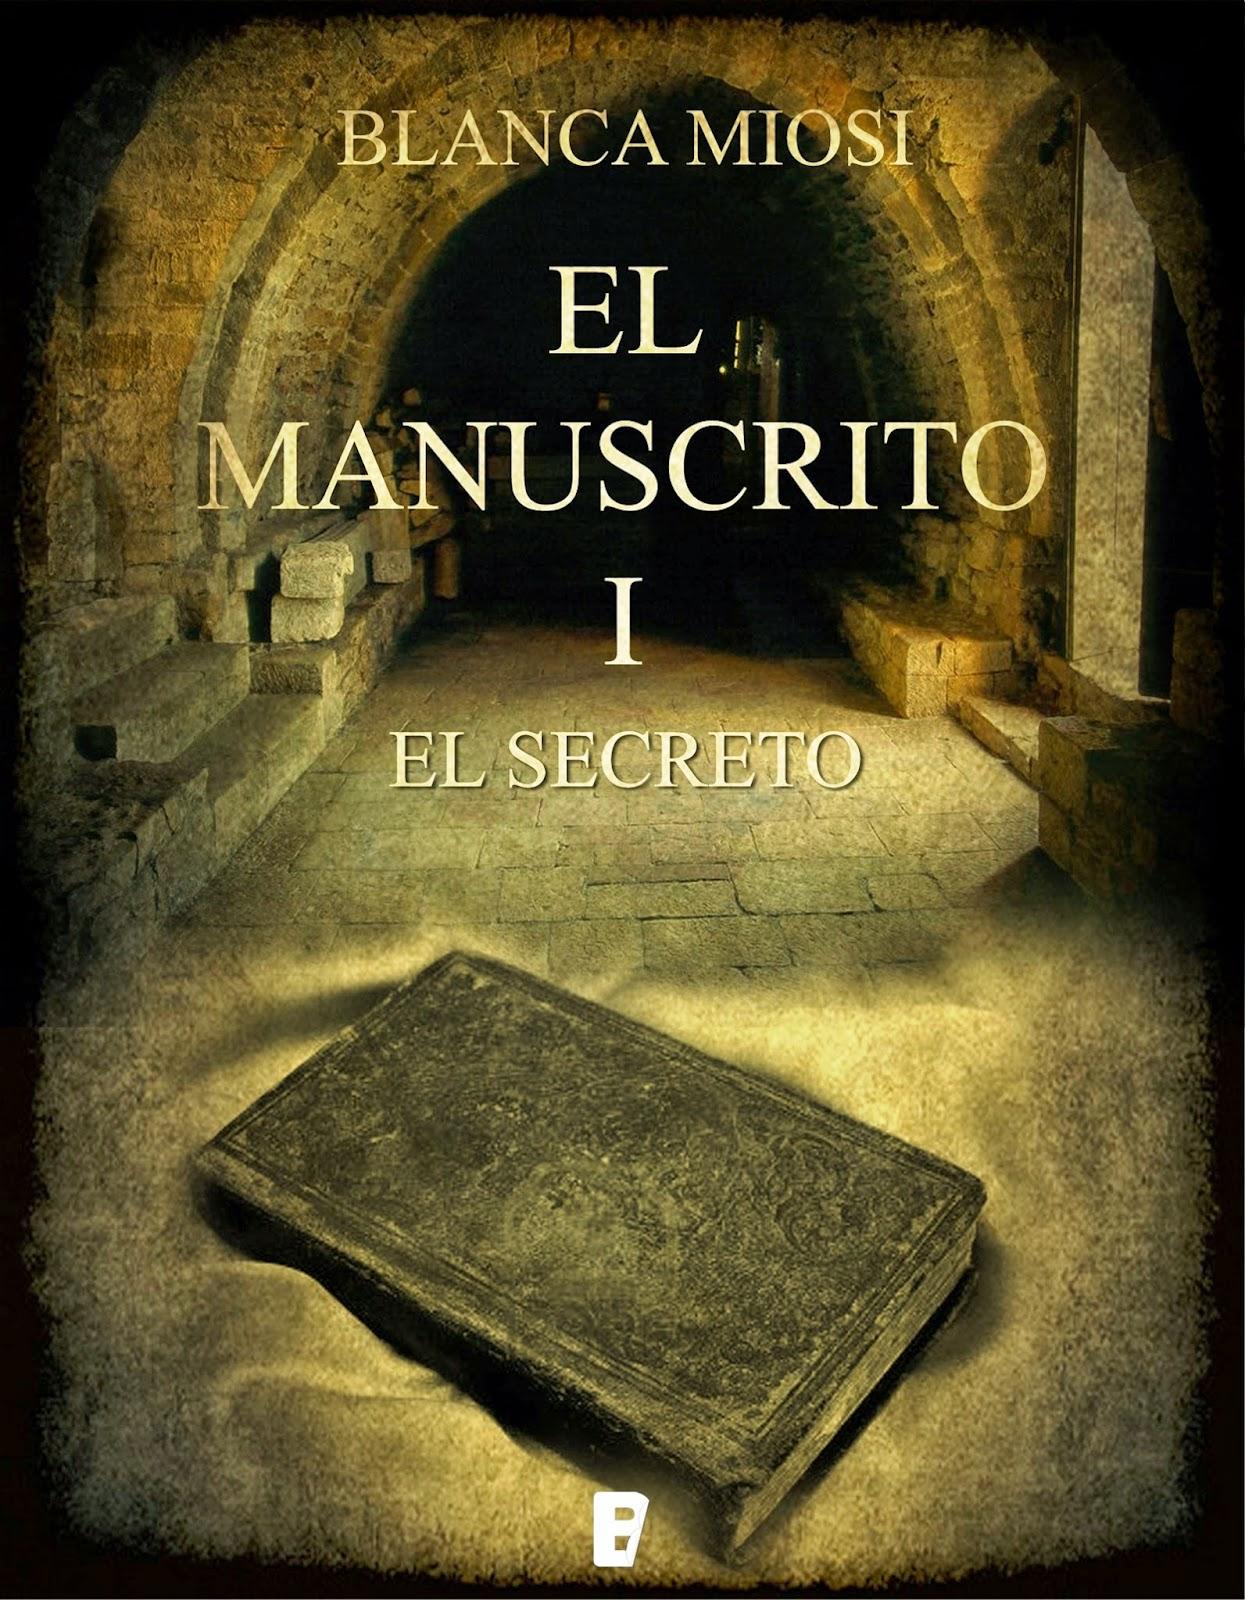 ELMANUSCRITO I. El Secreto. ( Blanca Miosi )